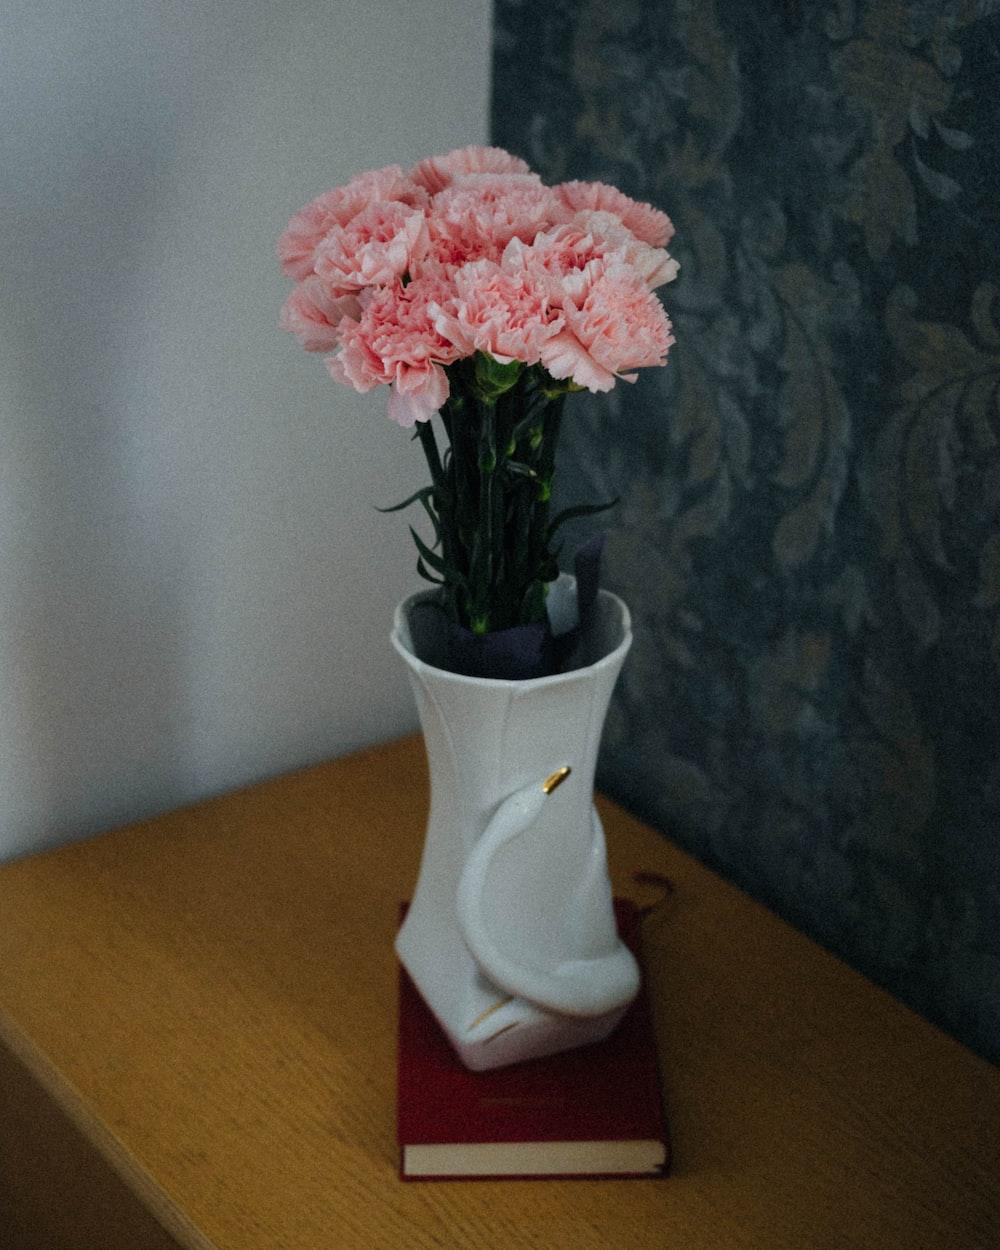 pink and white flower in white ceramic vase